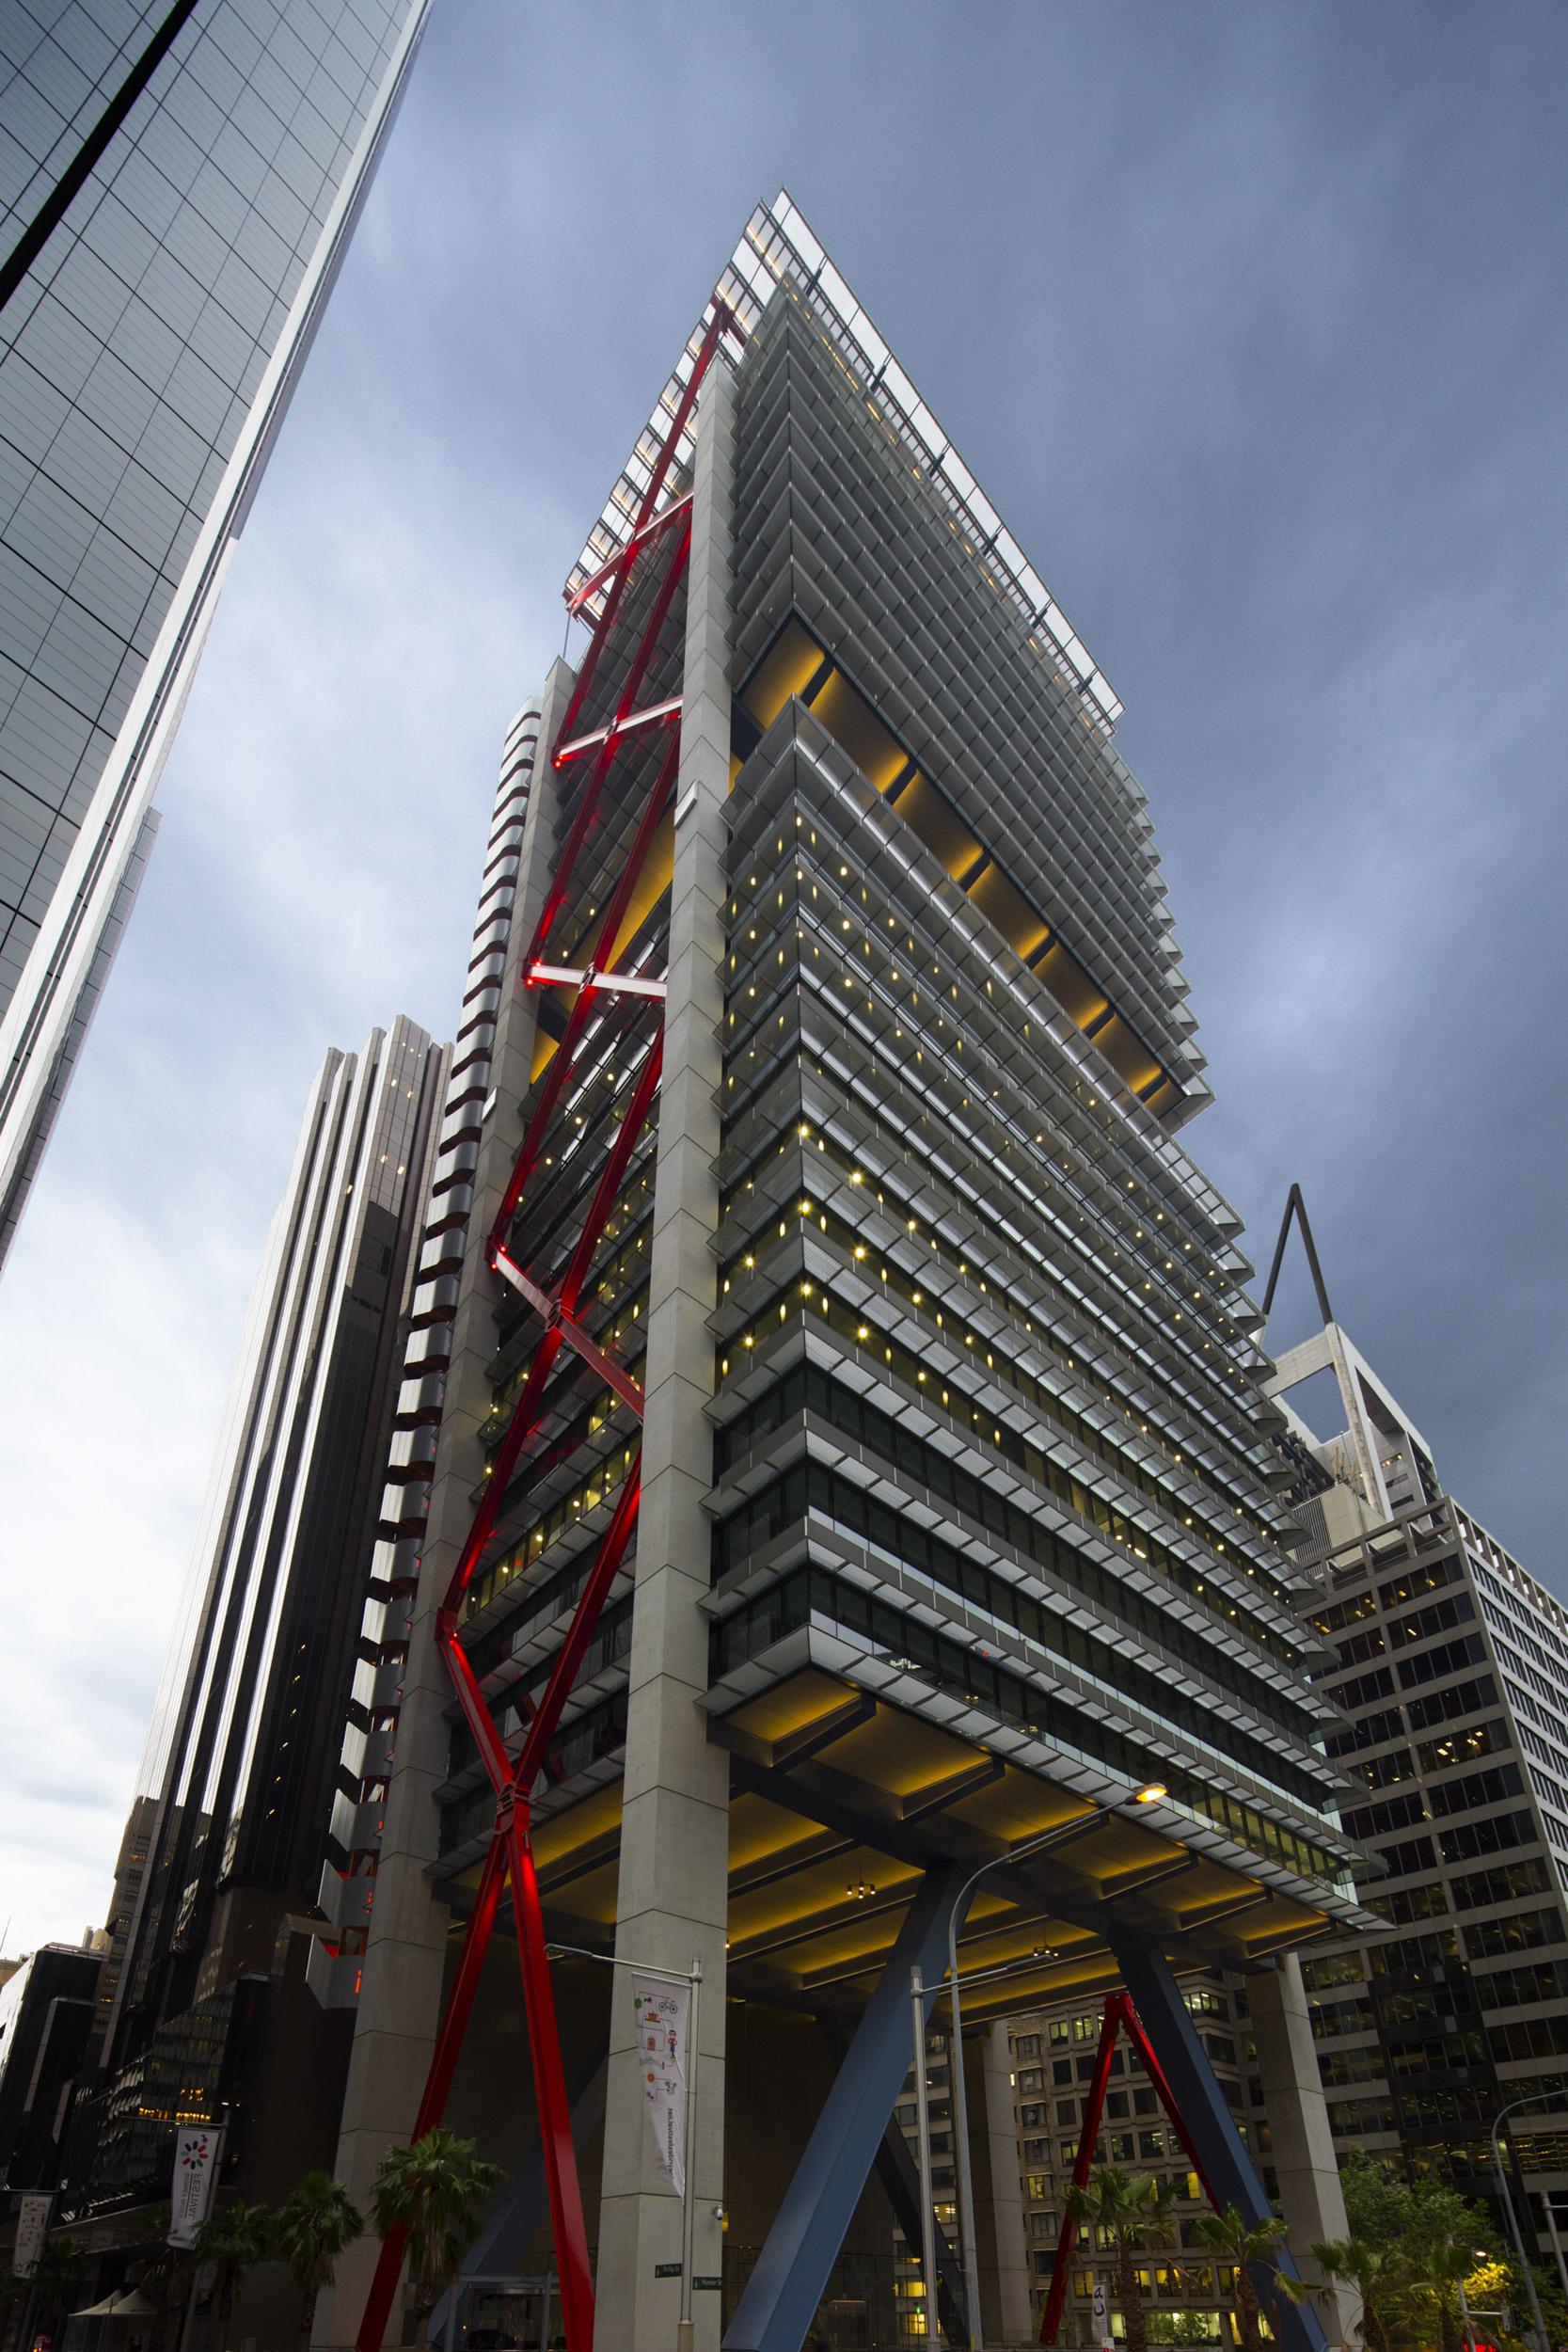 hirise_architecture_sydney_australia_08.jpg